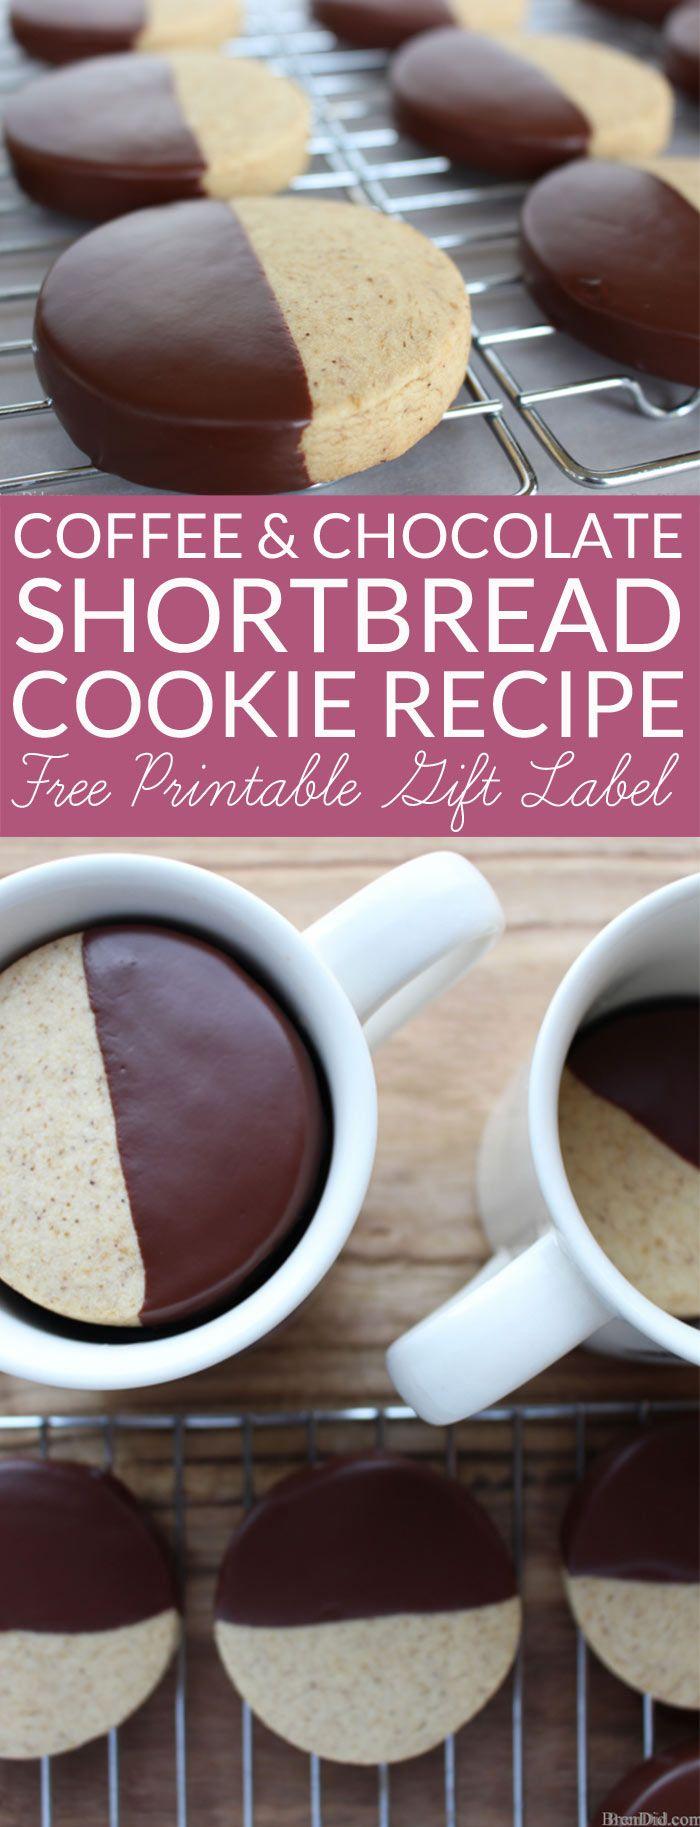 Mejores 95490 imgenes de hometalk diy christmas en pinterest coffee and chocolate shortbread cookie recipe free printable gift tag solutioingenieria Gallery